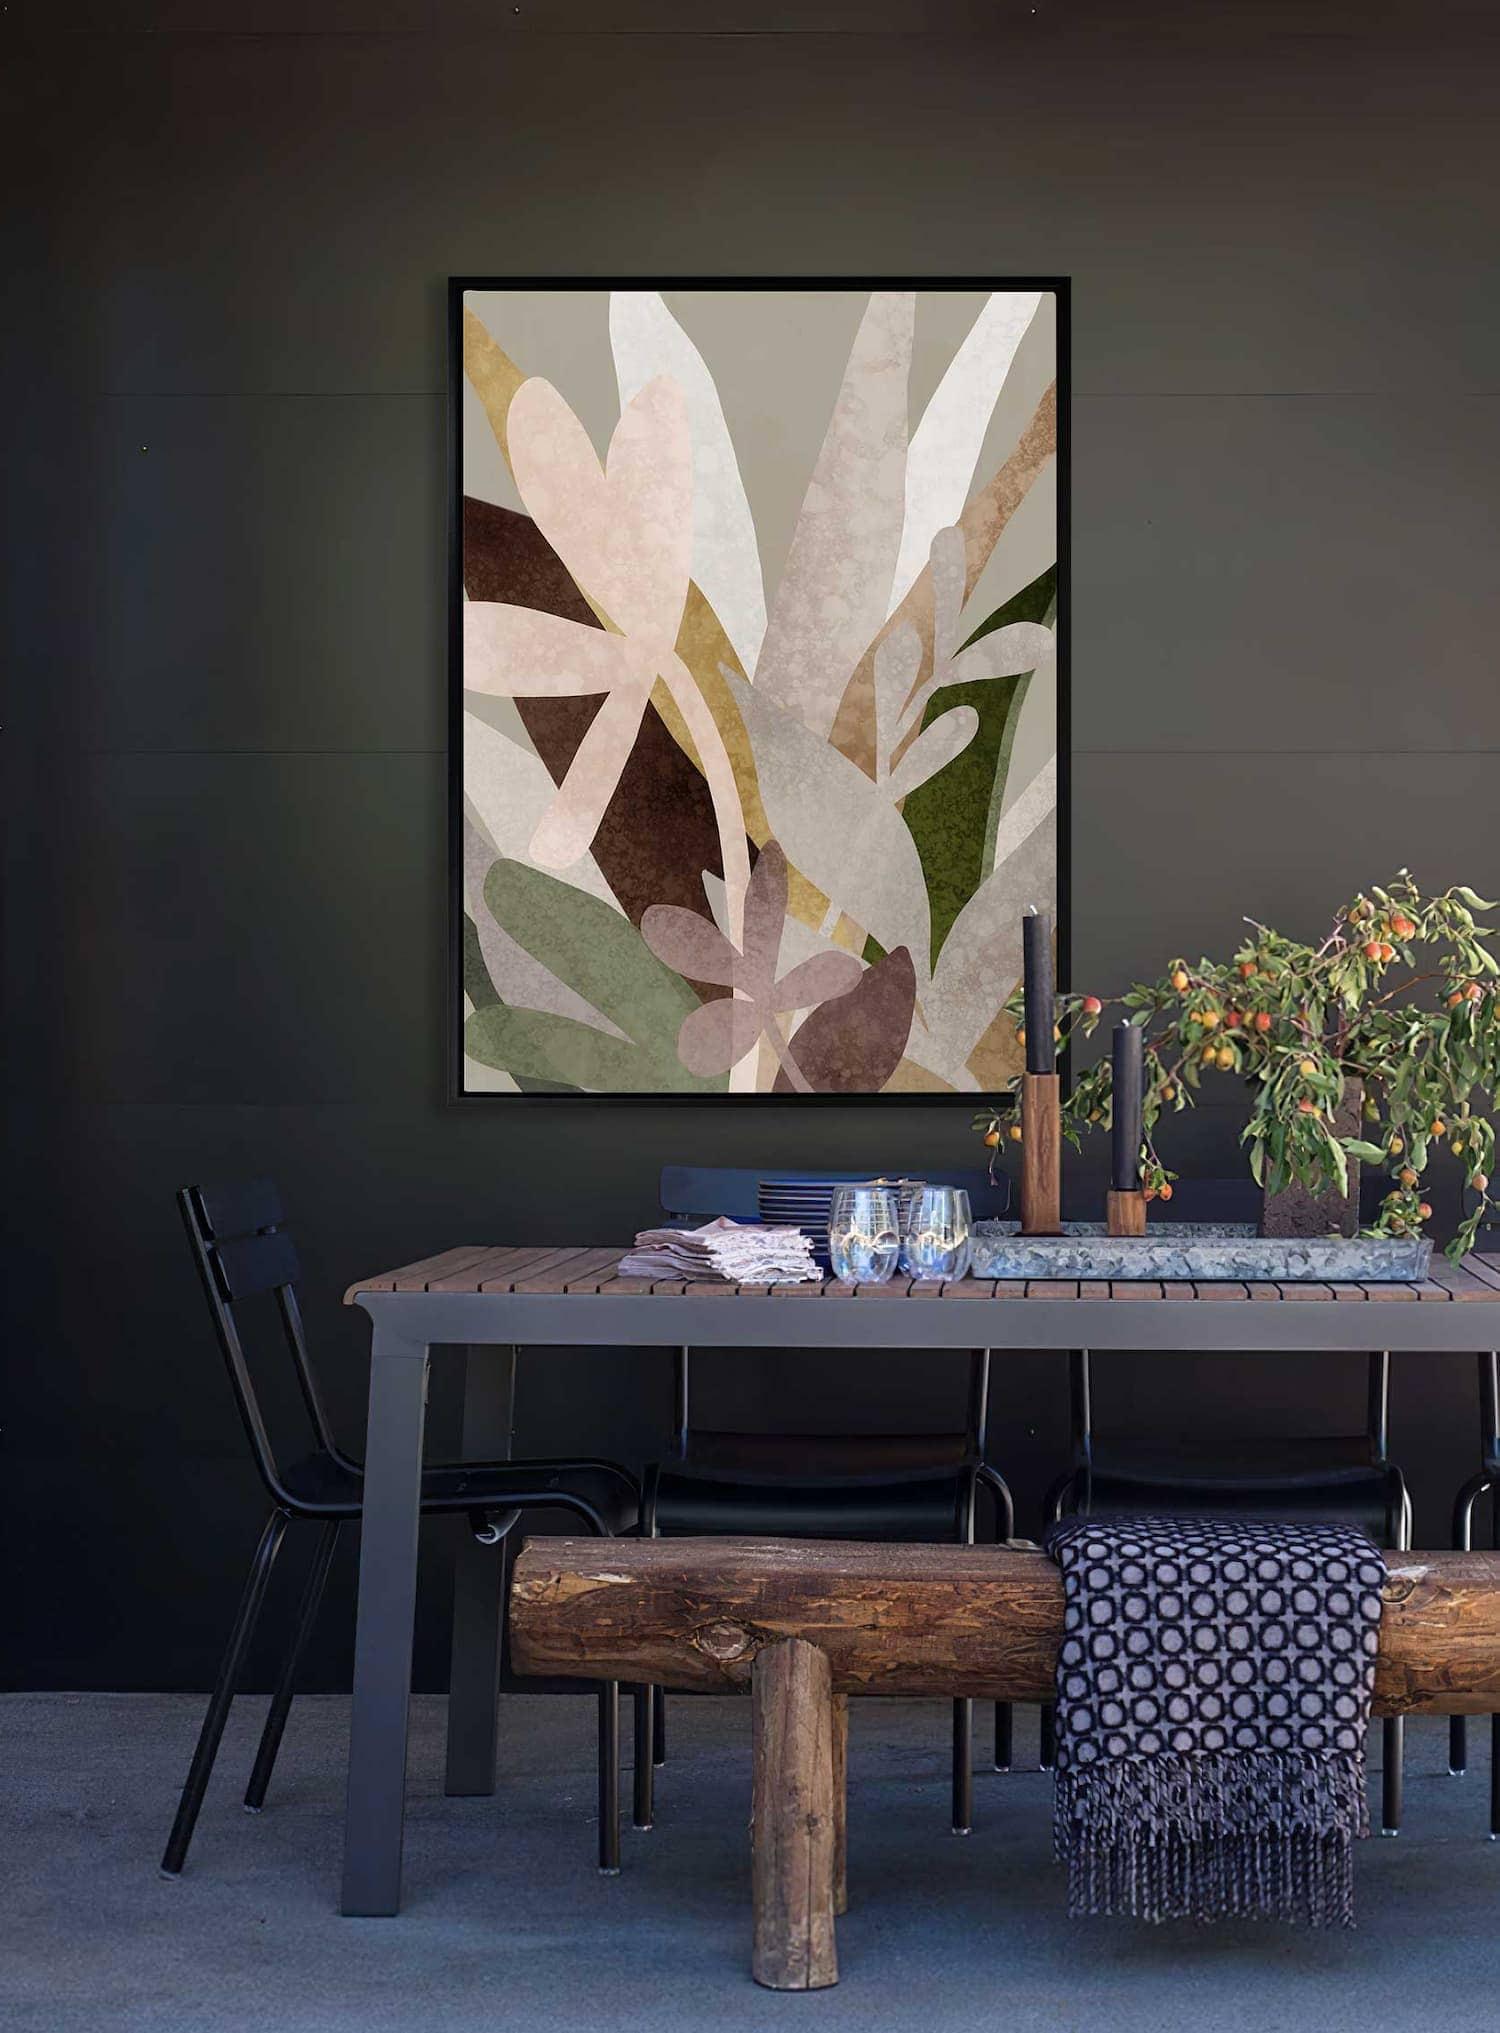 urban road moody abstract art in dark green dining room walls